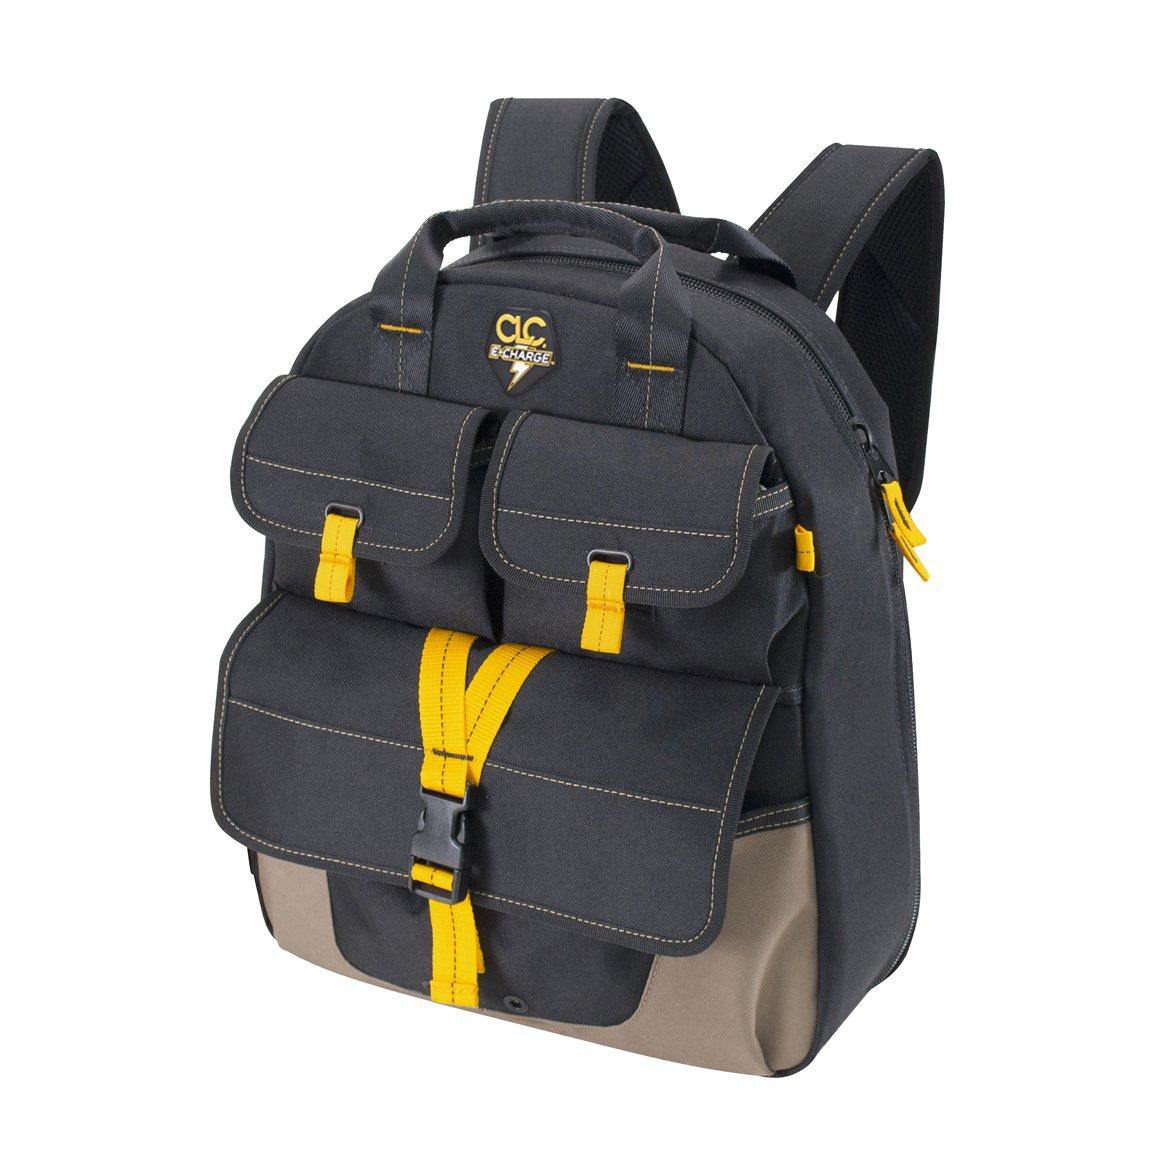 CLC Custom Leathercraft ECP135 E-Charge USB Charging Tool Backpack, 23-Pocket